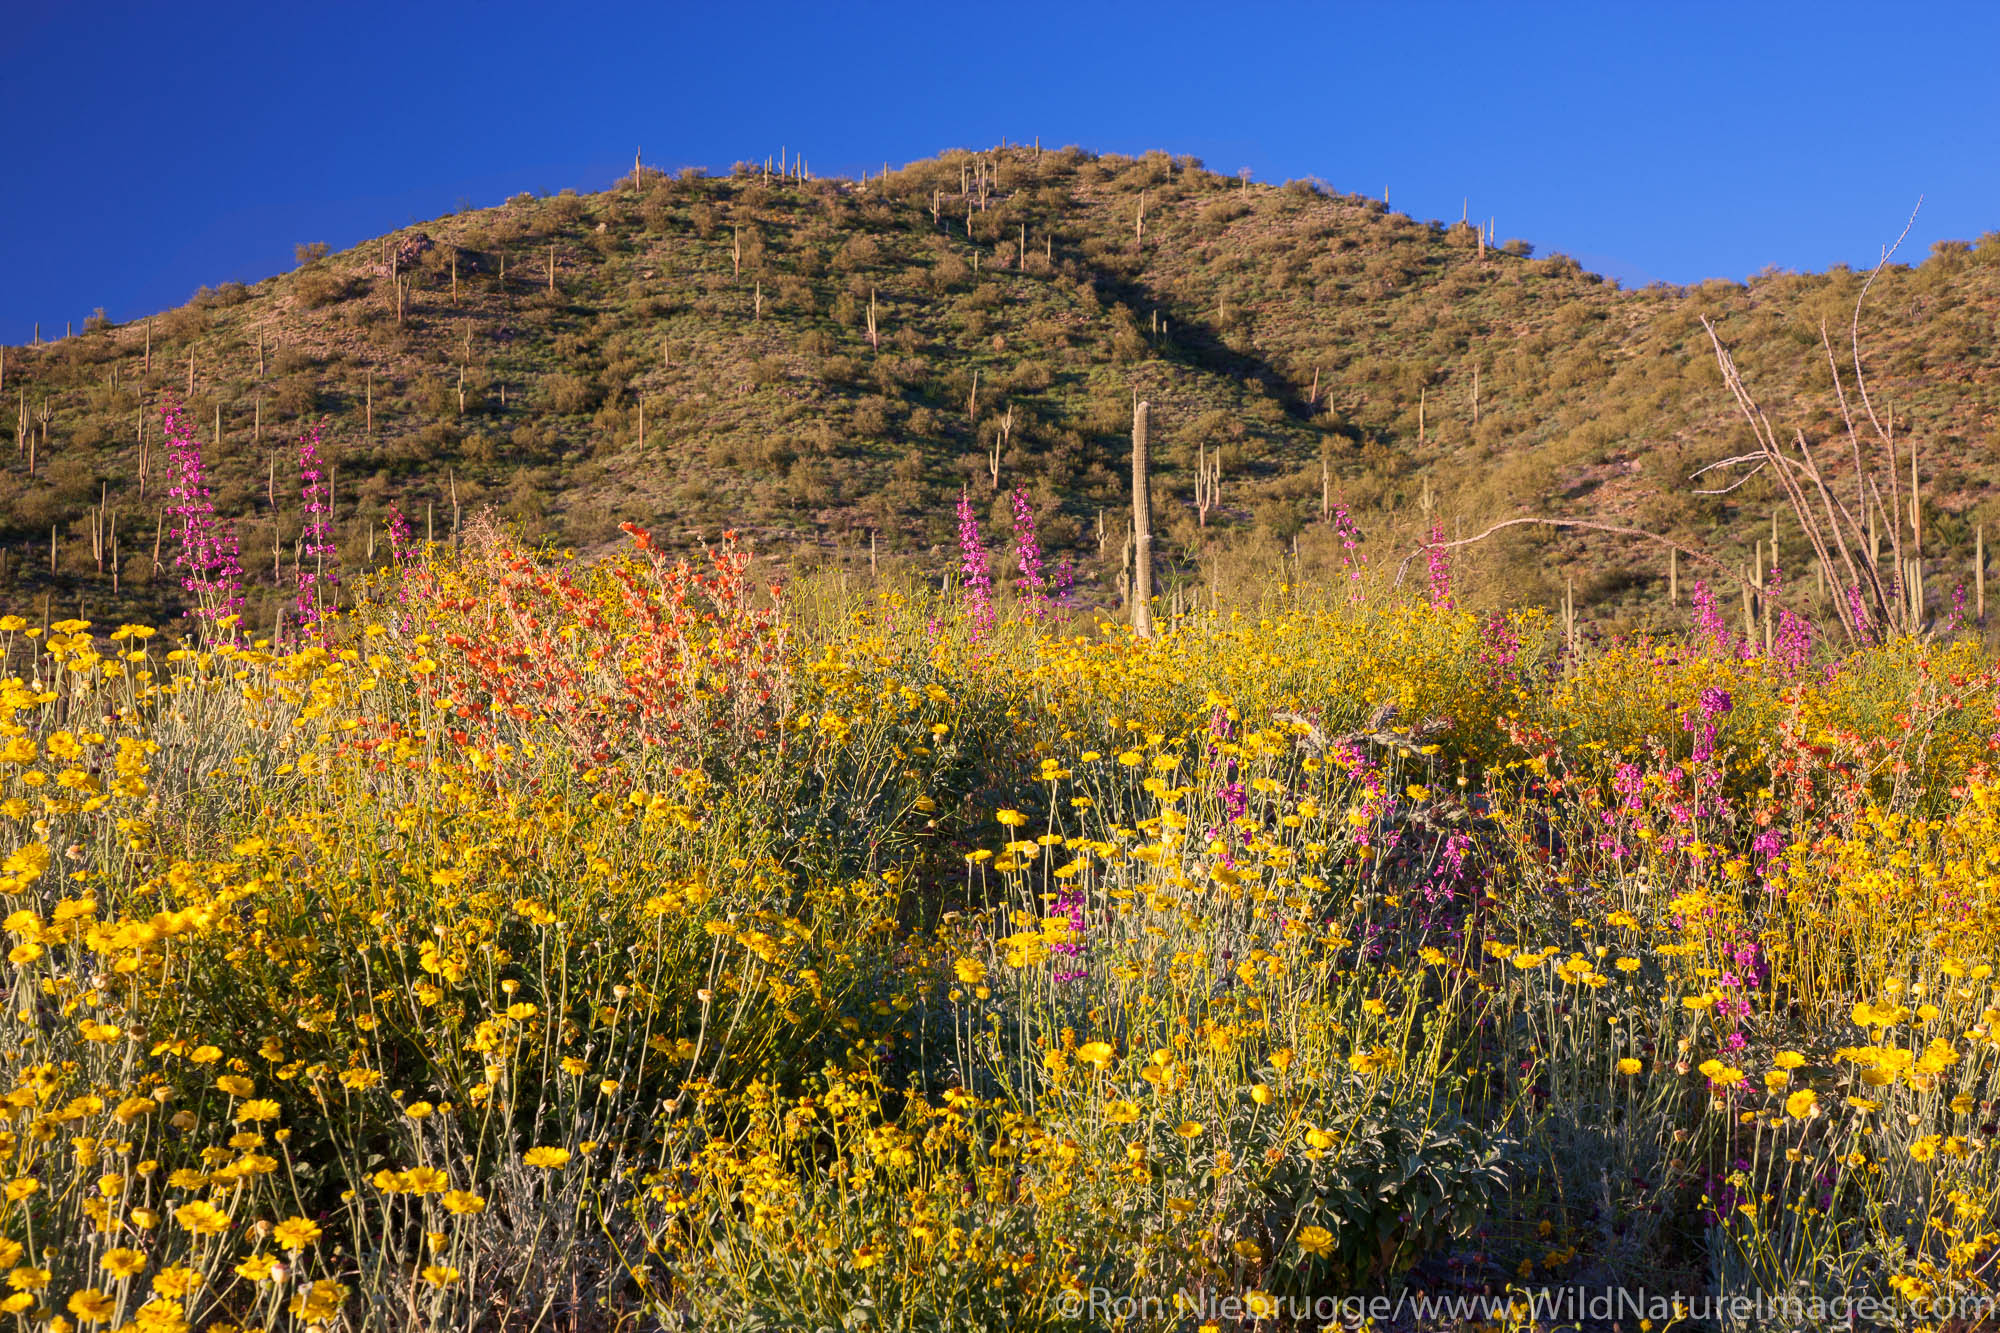 Spring wildflowers, Tonto National Forest, East of Phoenix, Arizona.